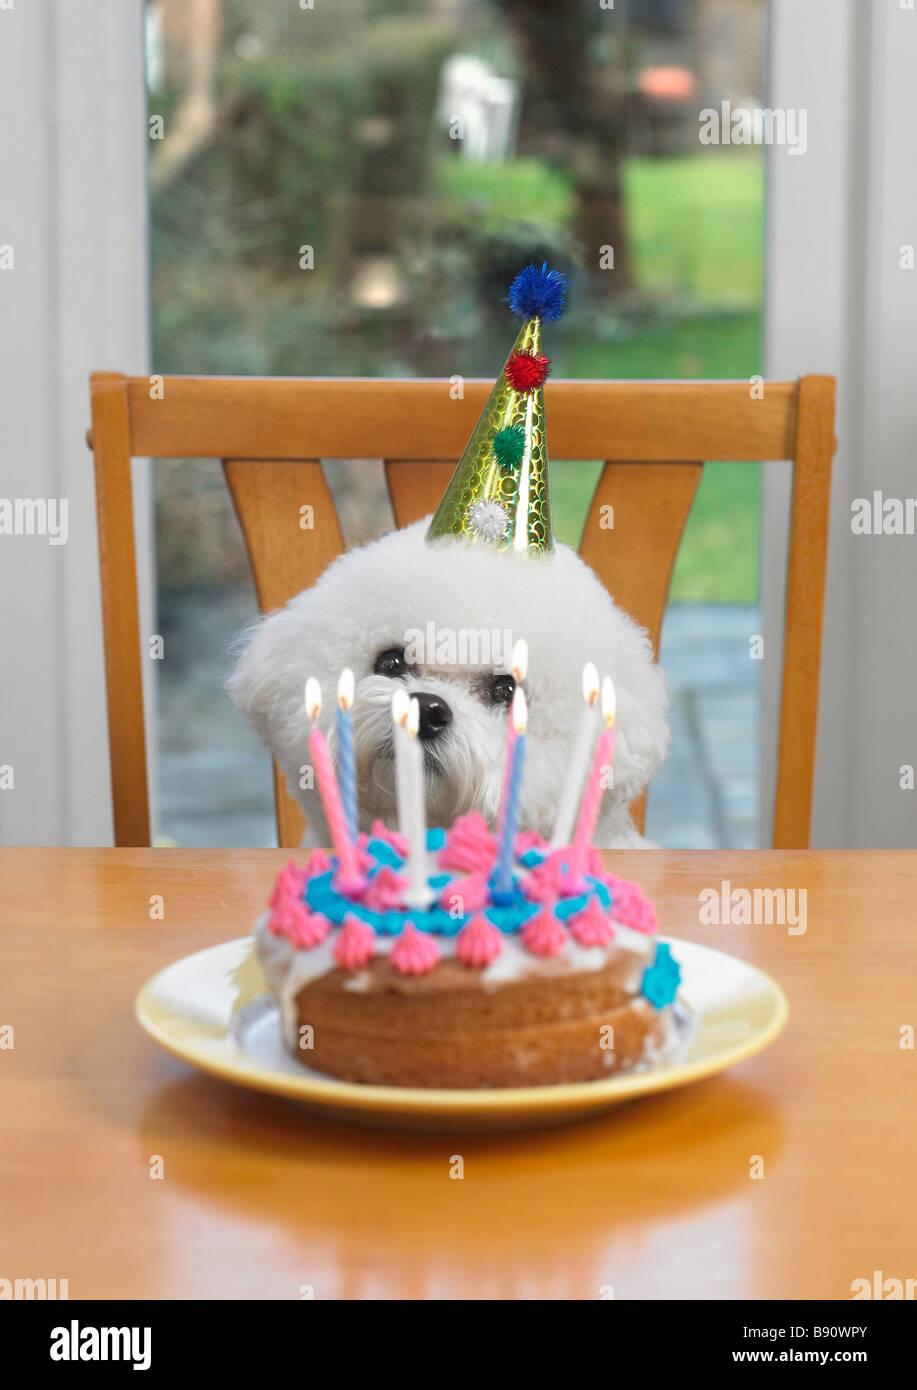 Miraculous Dog With Birthday Cake Stock Photo 22762515 Alamy Personalised Birthday Cards Paralily Jamesorg